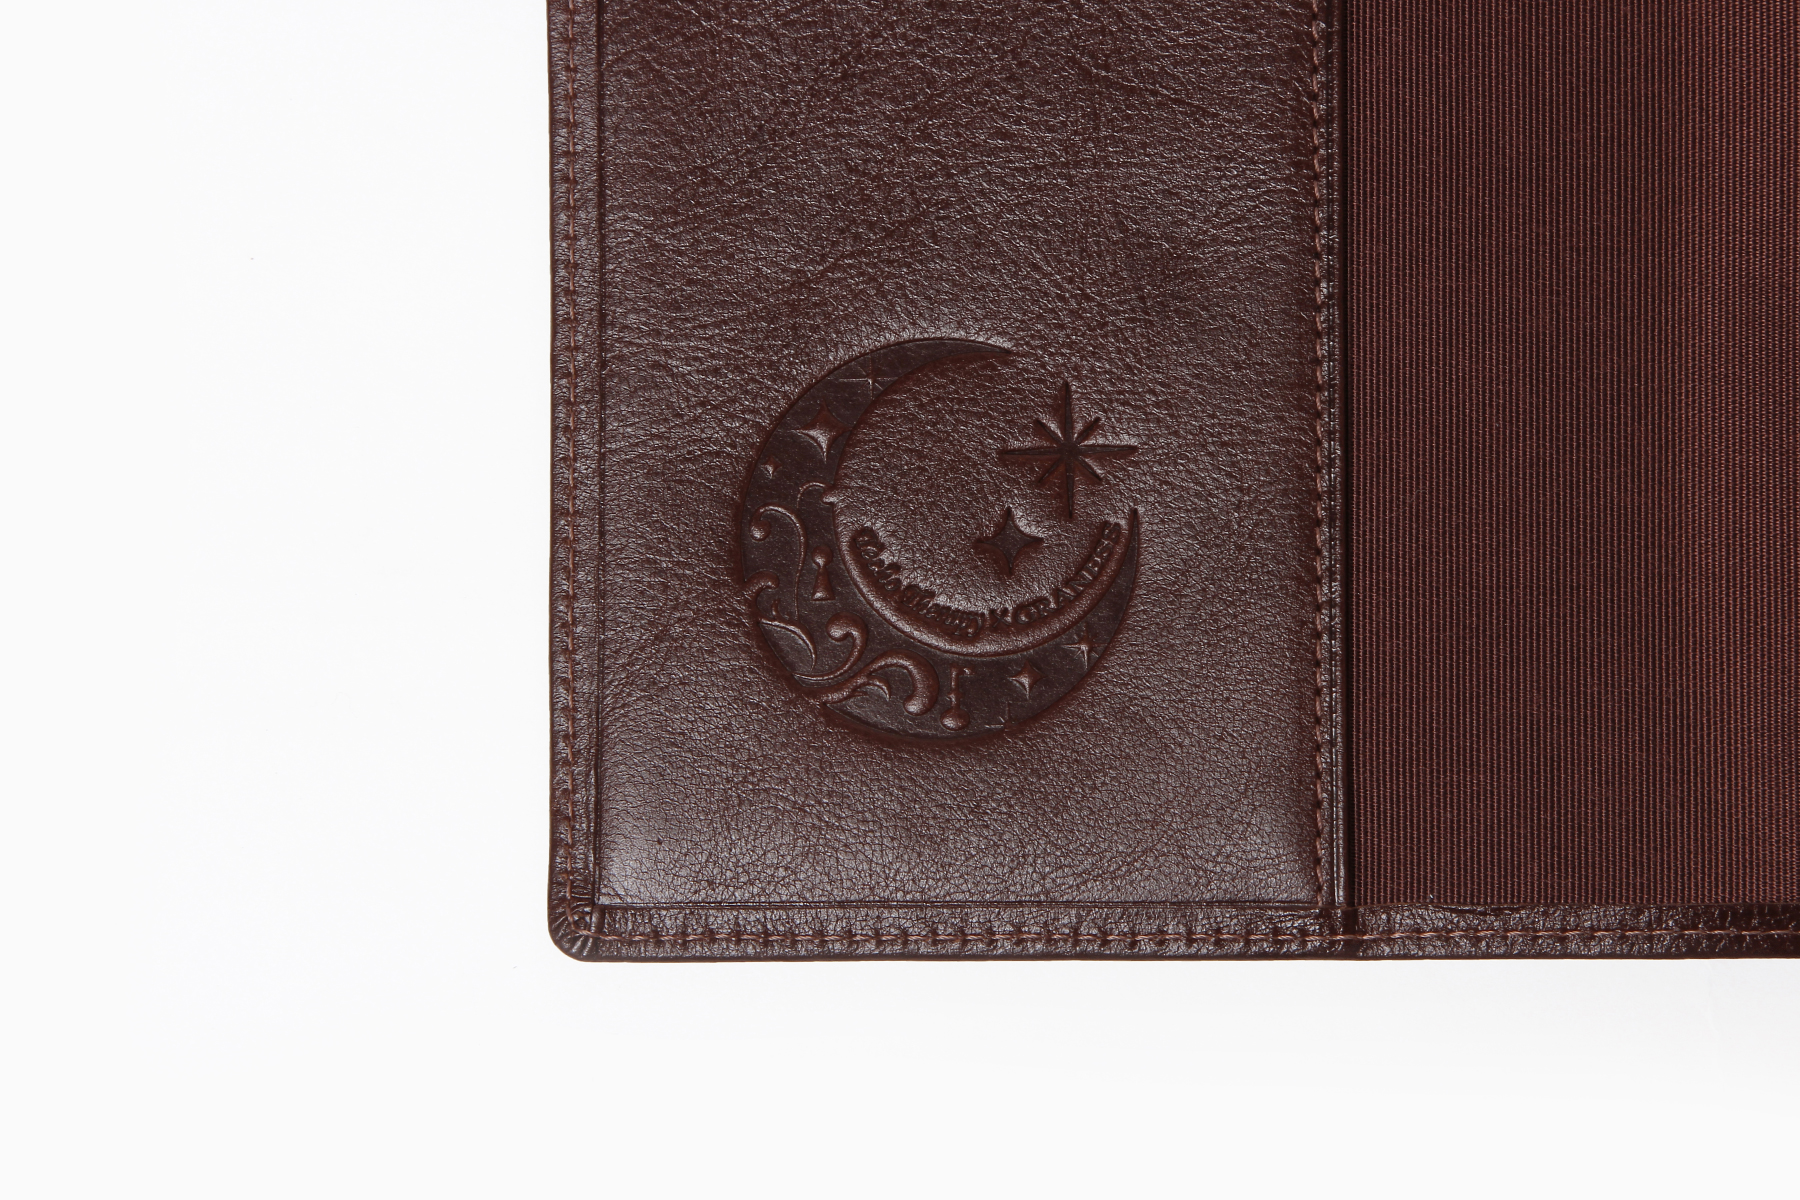 B6サイズ手帳カバー・バタフライストッパー付きへの名入れ刻印